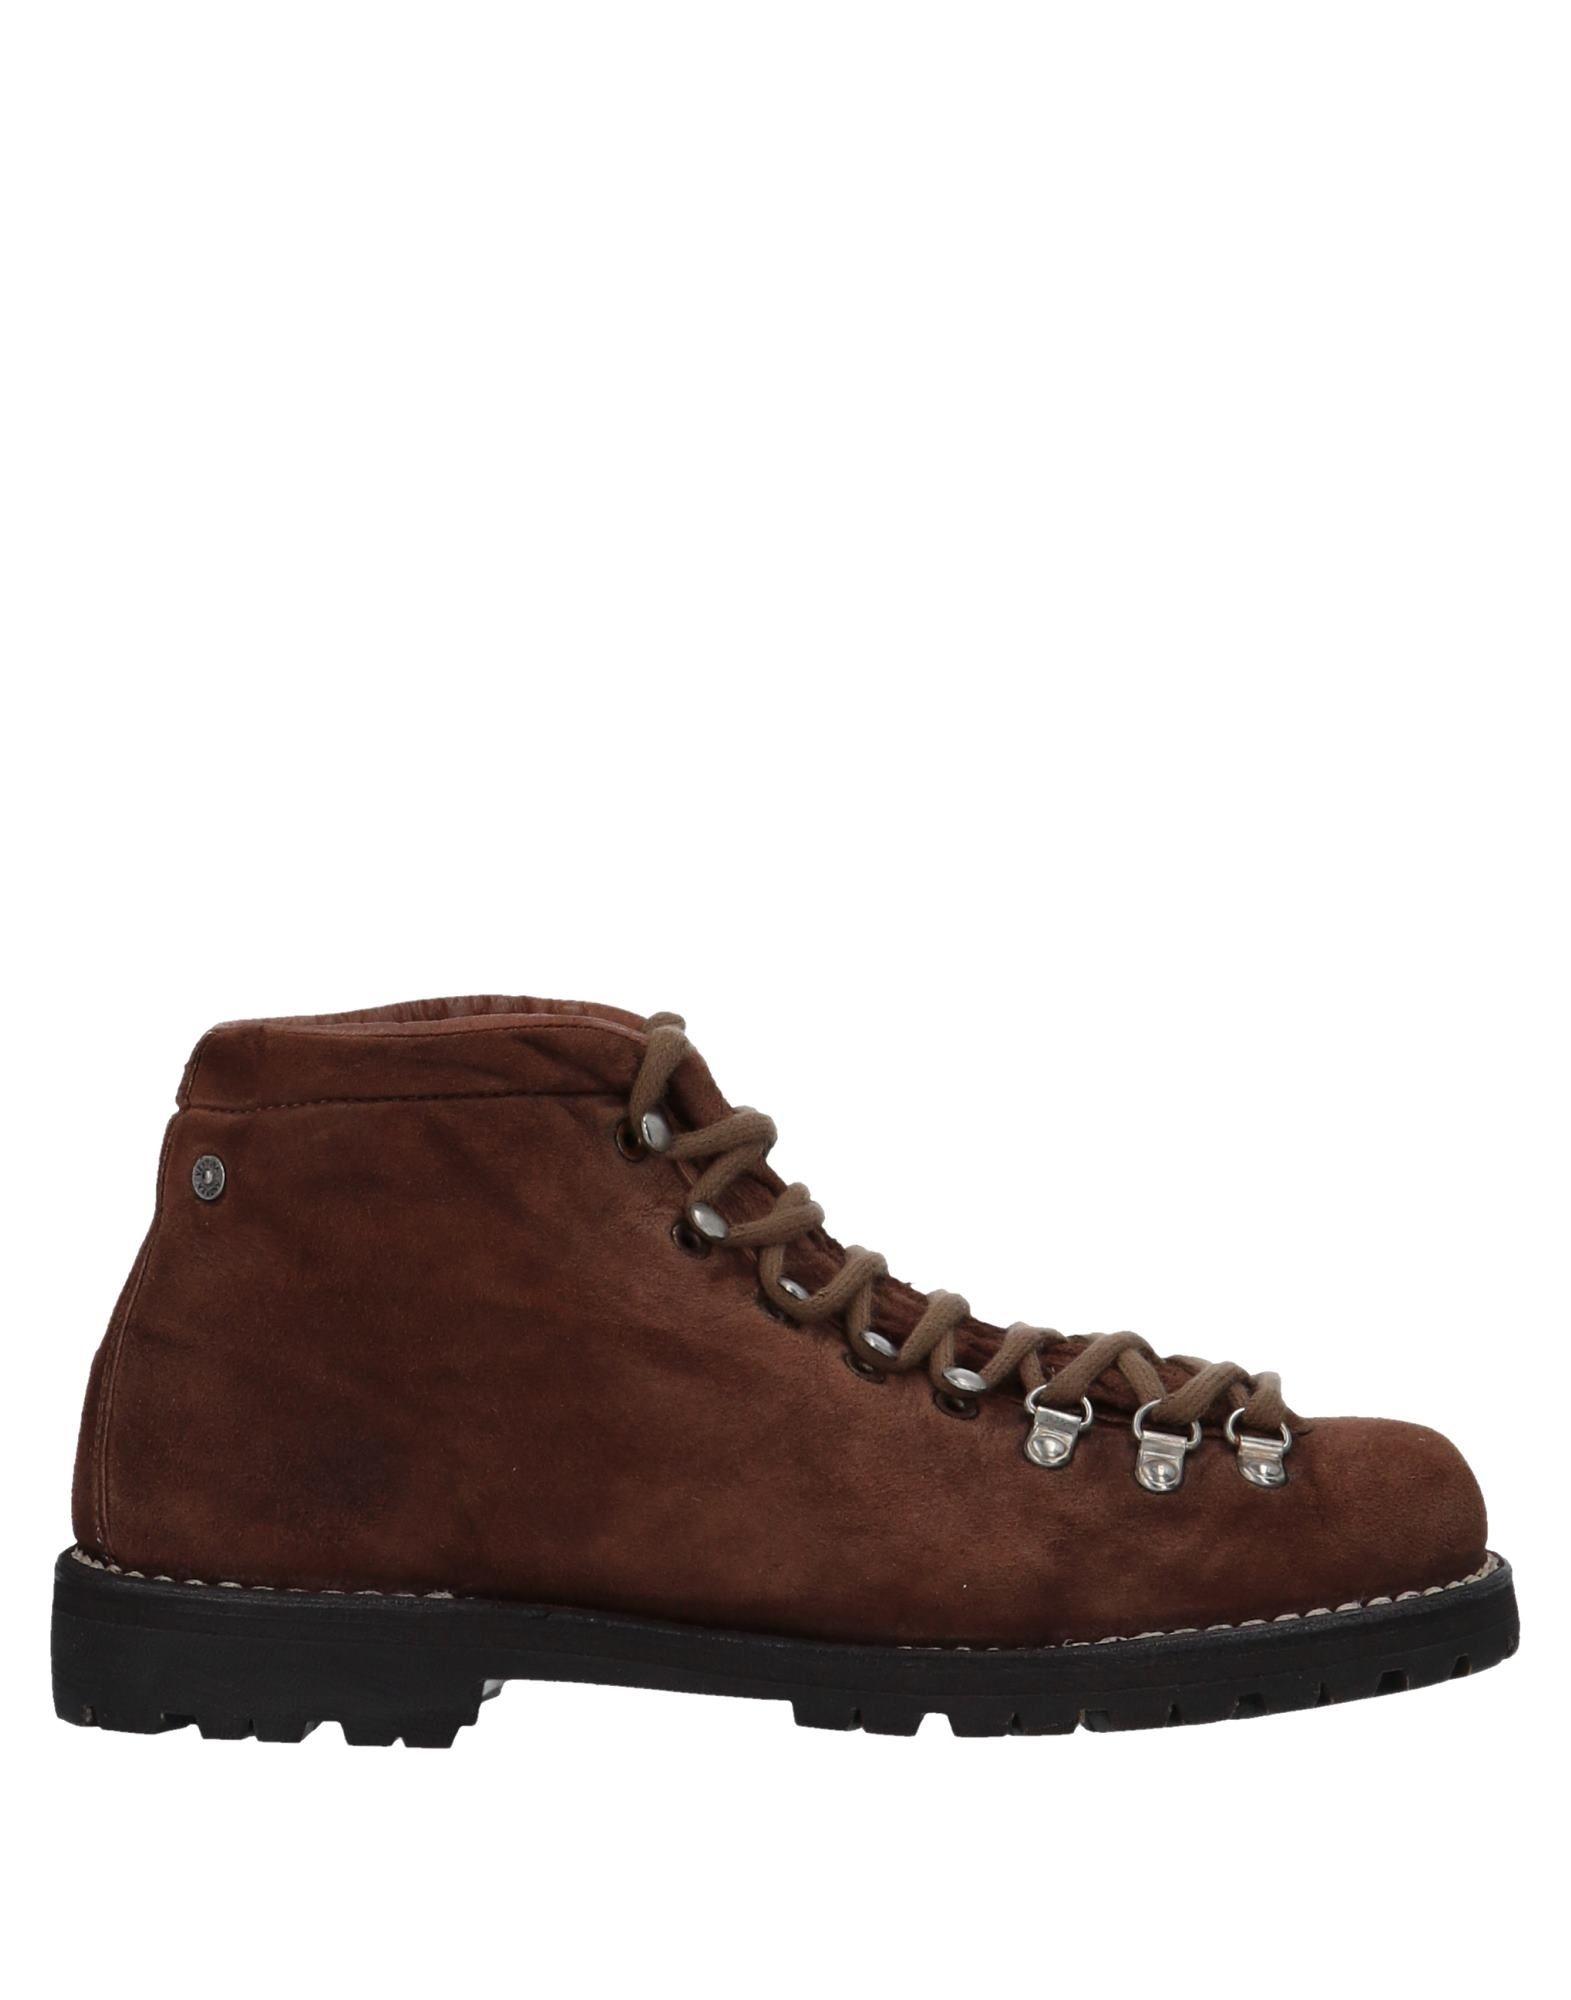 Le Cortina By Andrea Ventura Stiefelette Herren  11280674FT Gute Qualität beliebte Schuhe